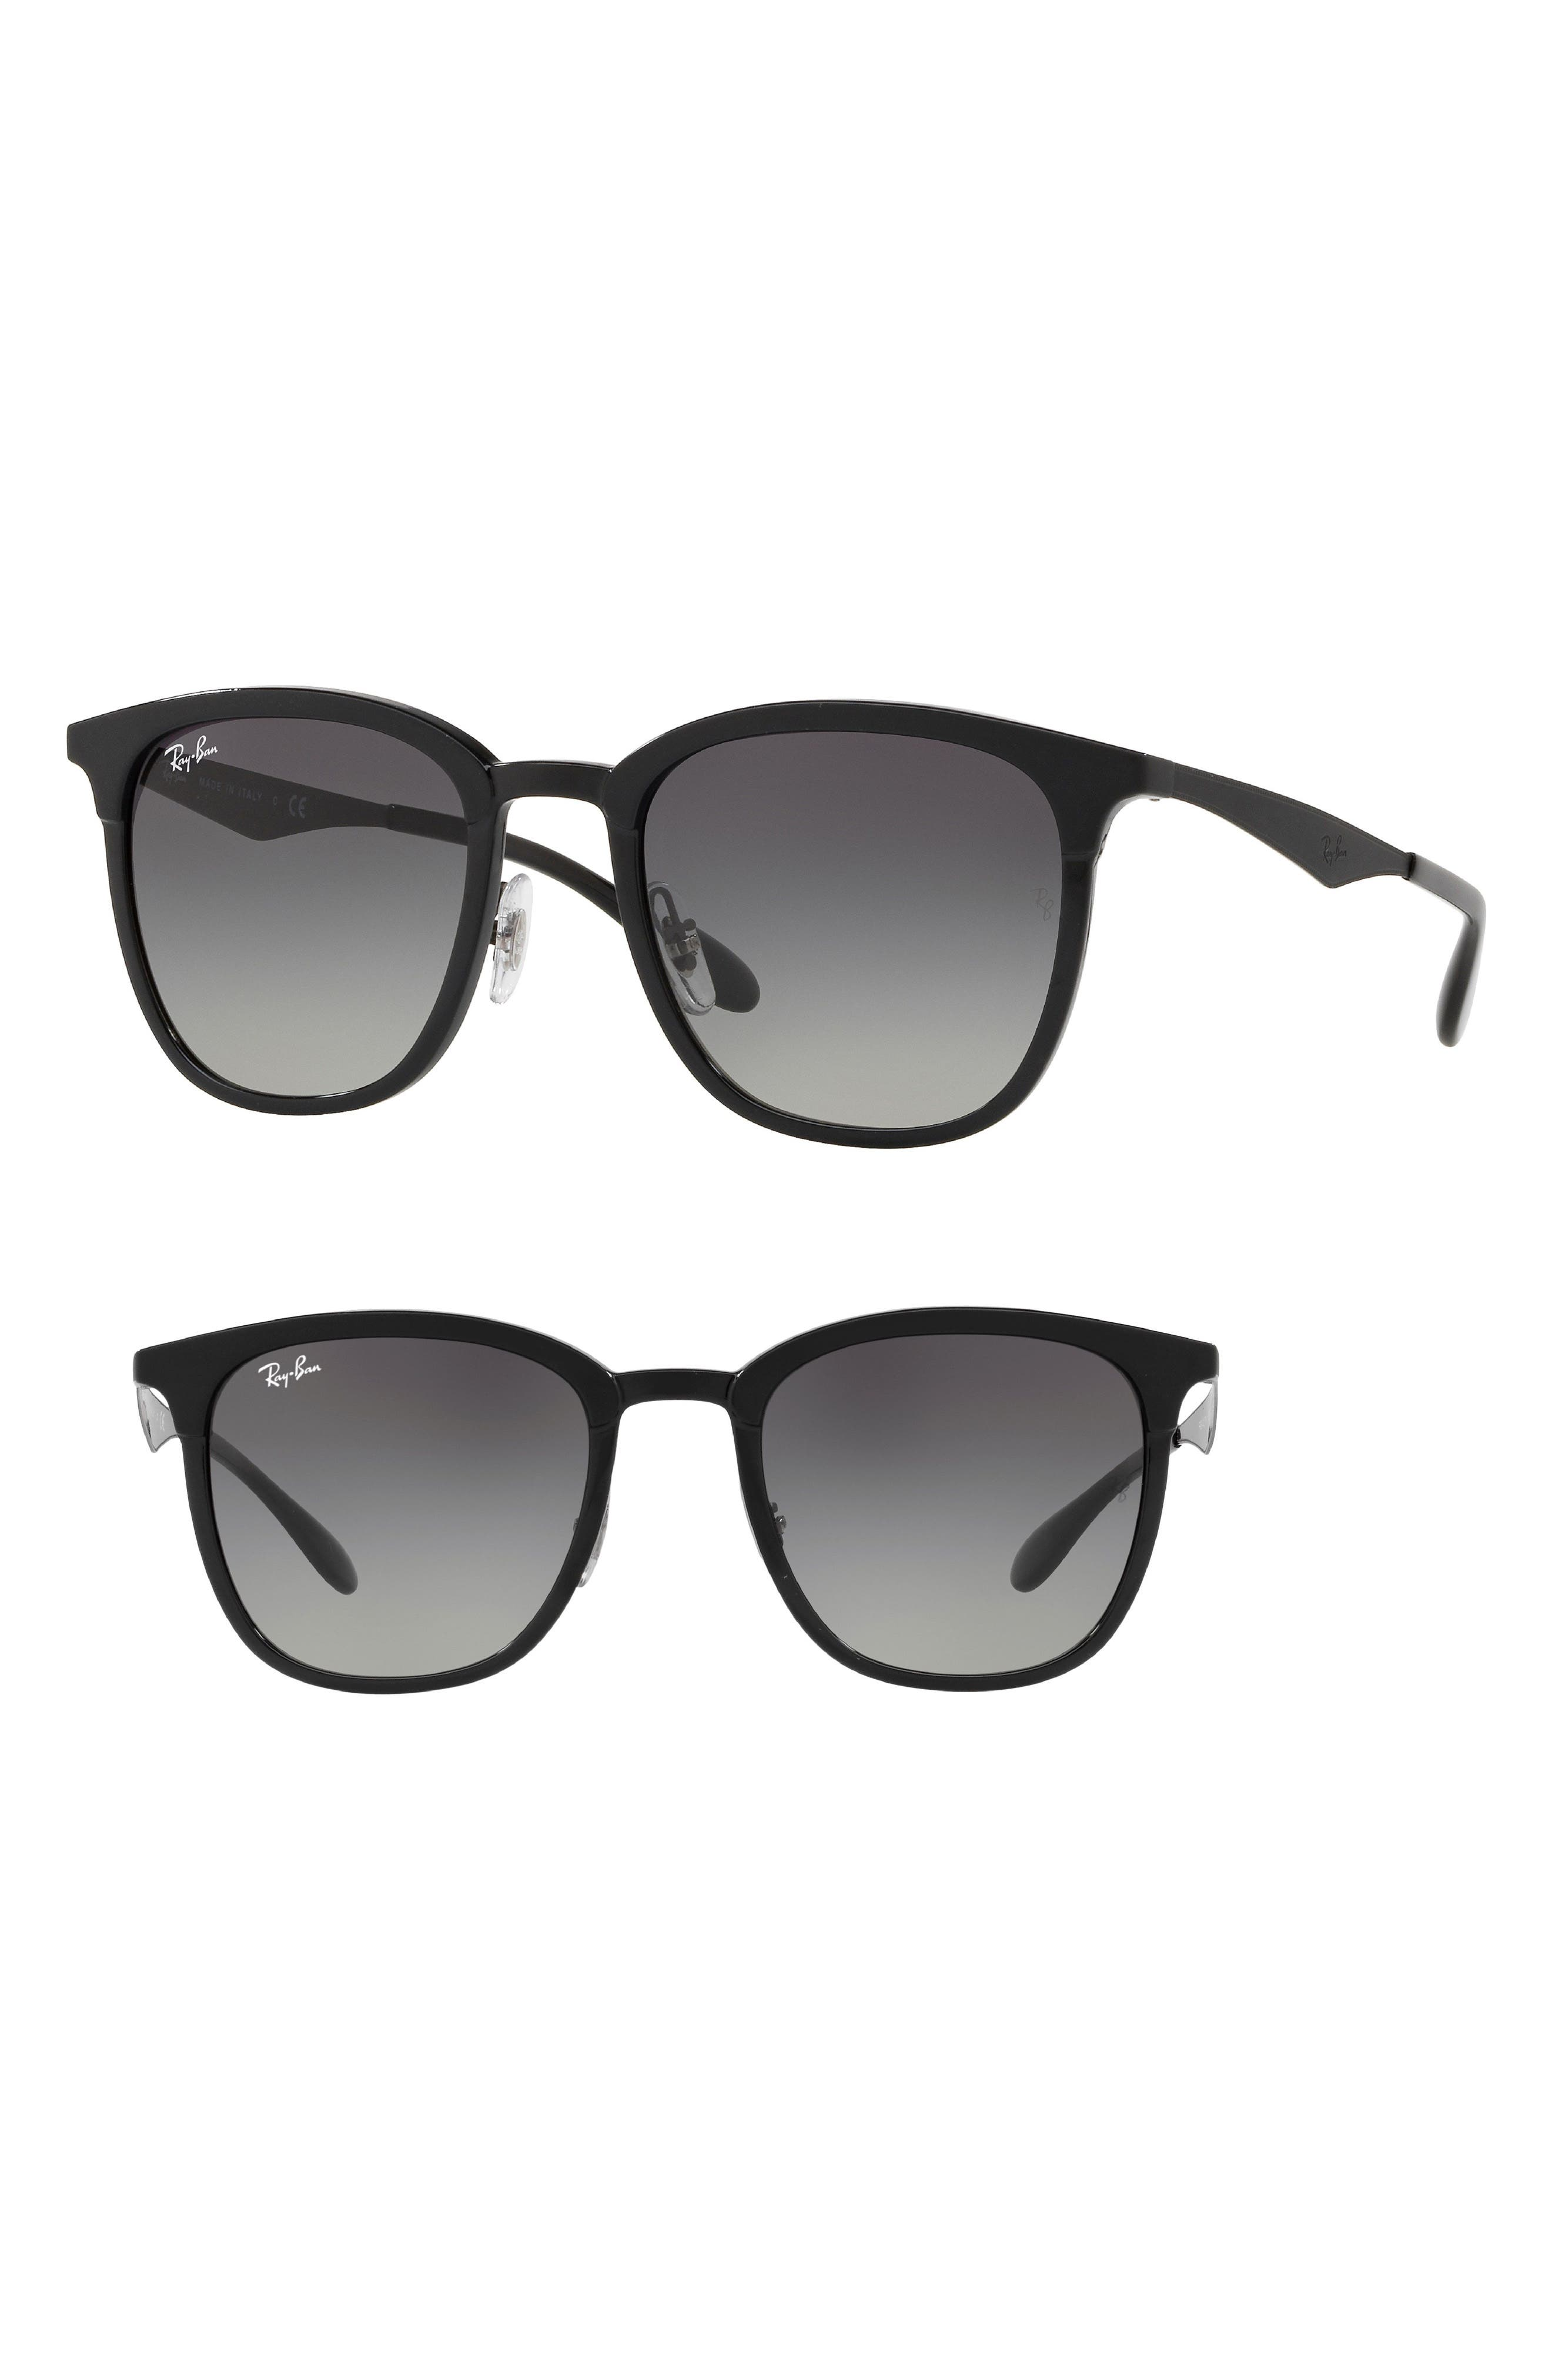 Highstreet 51mm Square Sunglasses,                         Main,                         color, Black